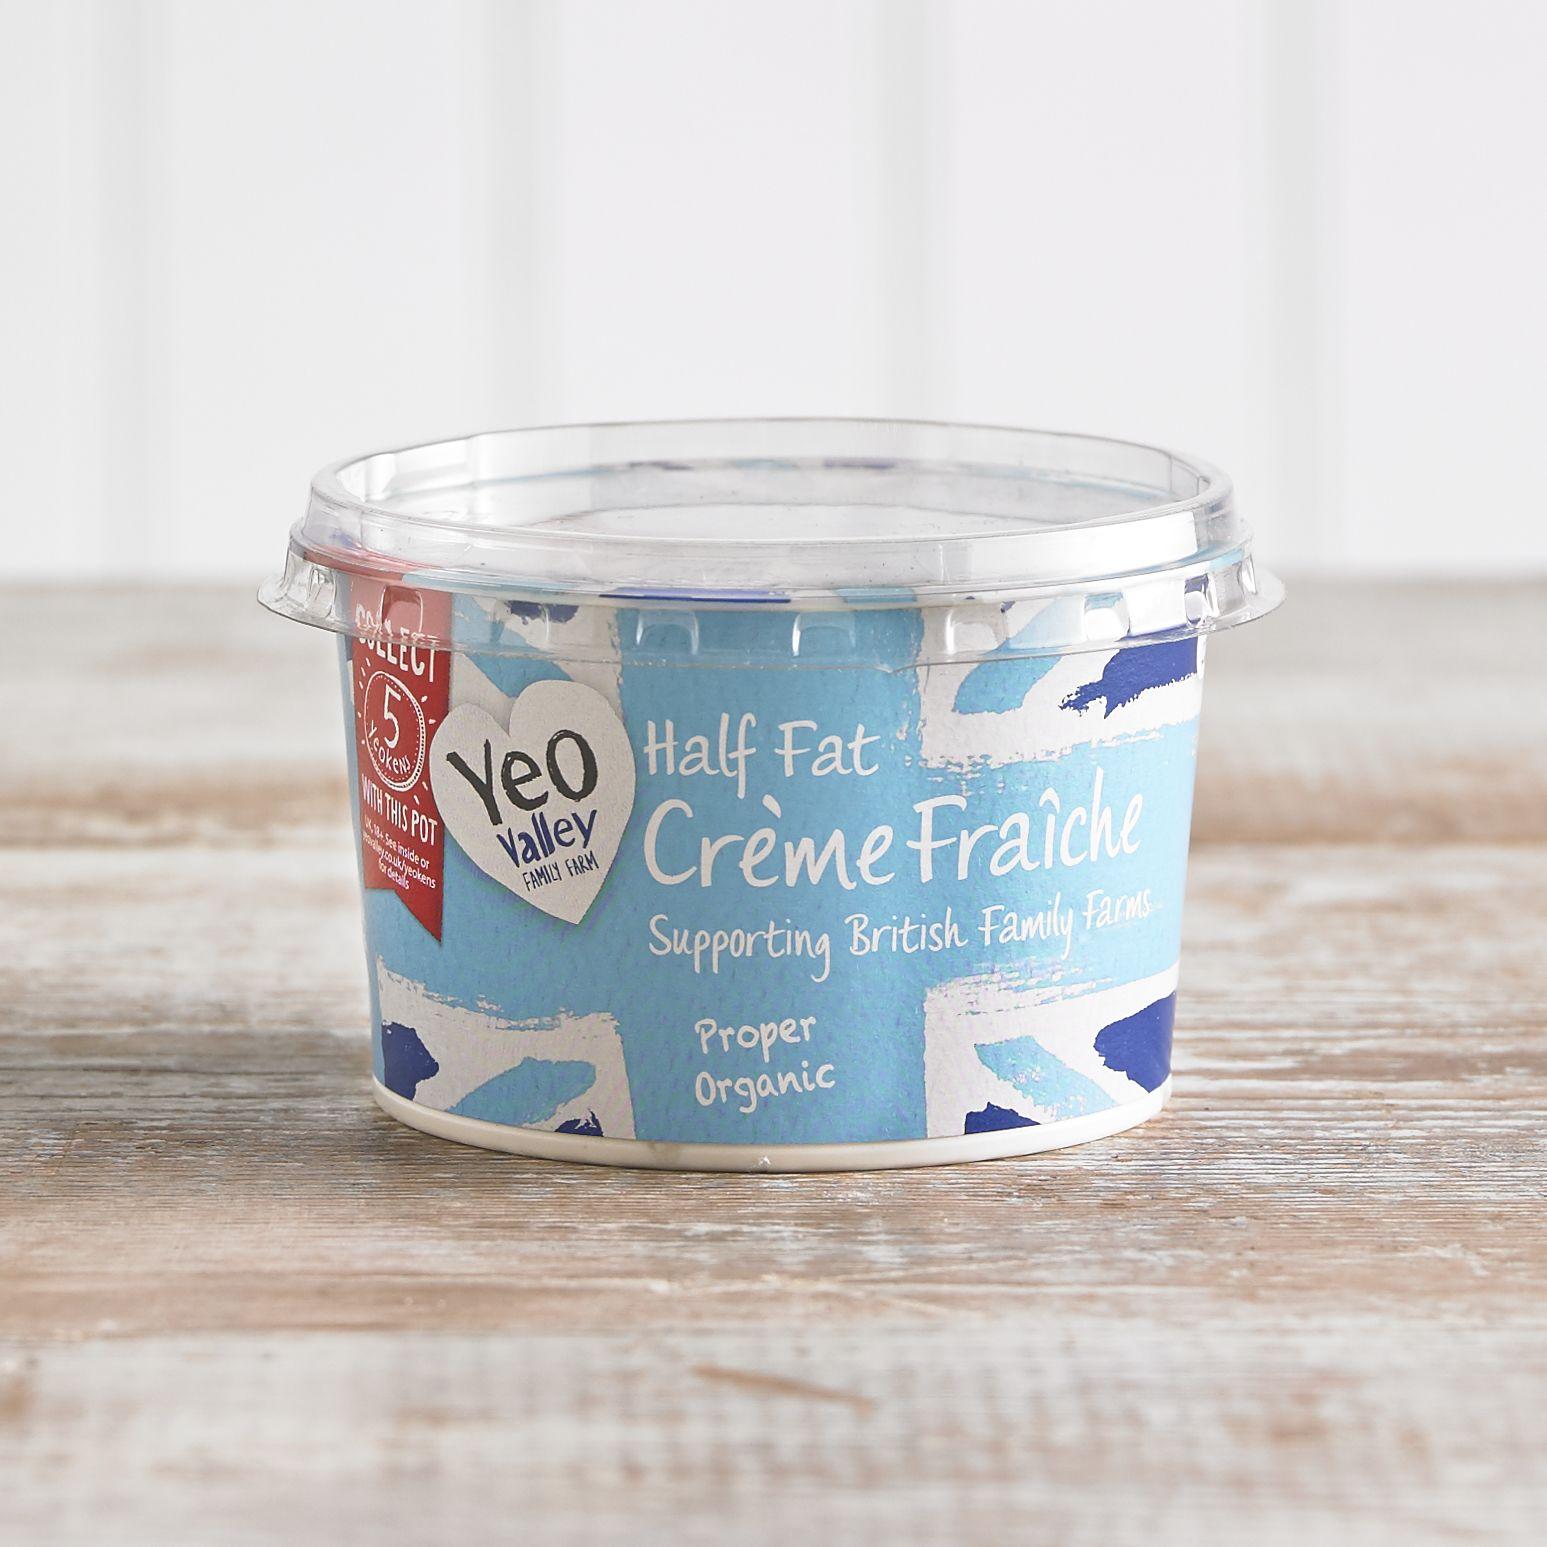 Yeo Valley Organic Half Fat Crème Fraiche, 200g